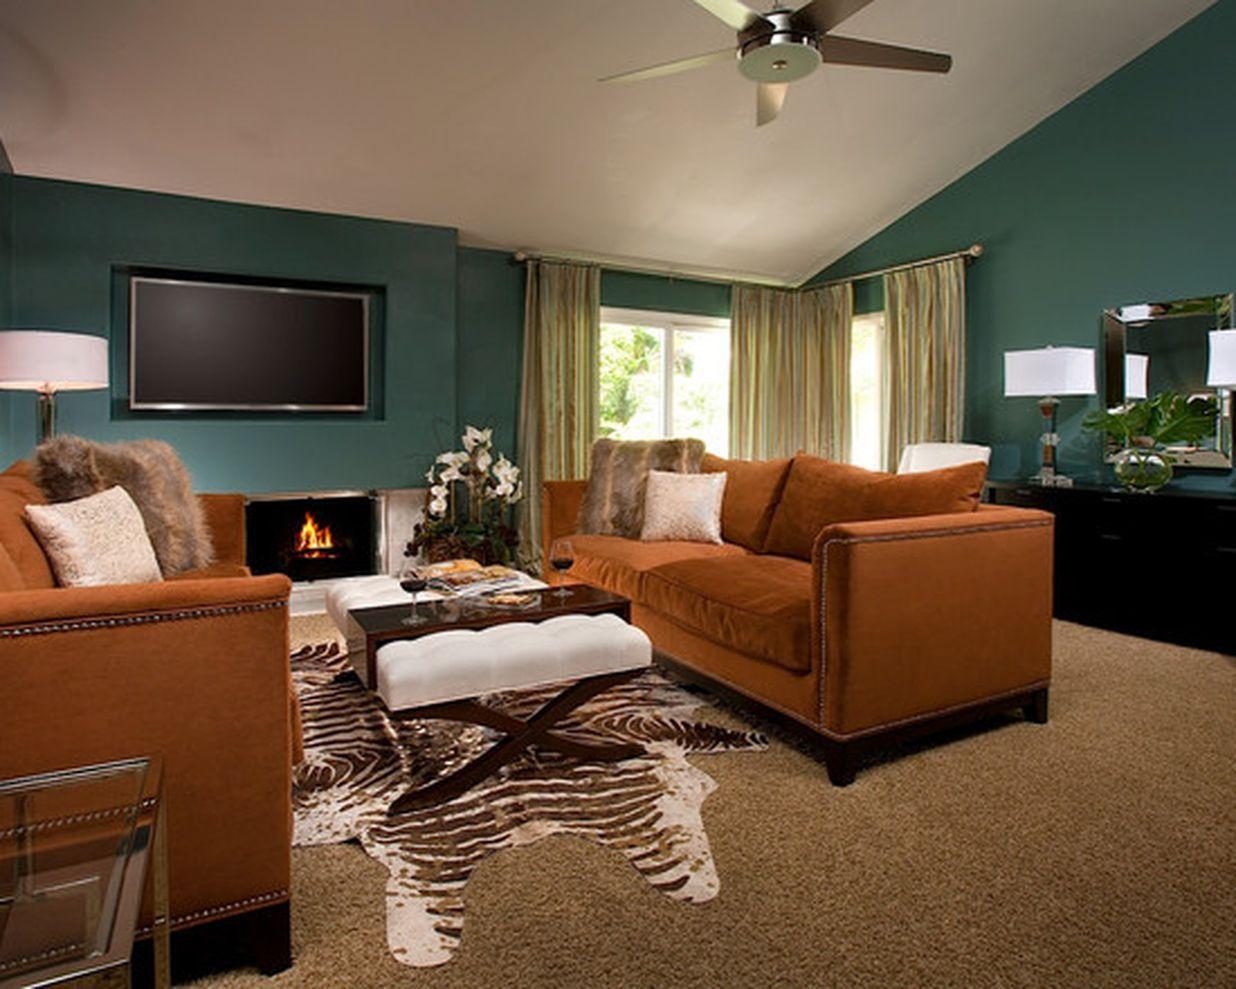 53 Adorable Burnt Orange And Teal Living Room Ideas   Teal ...